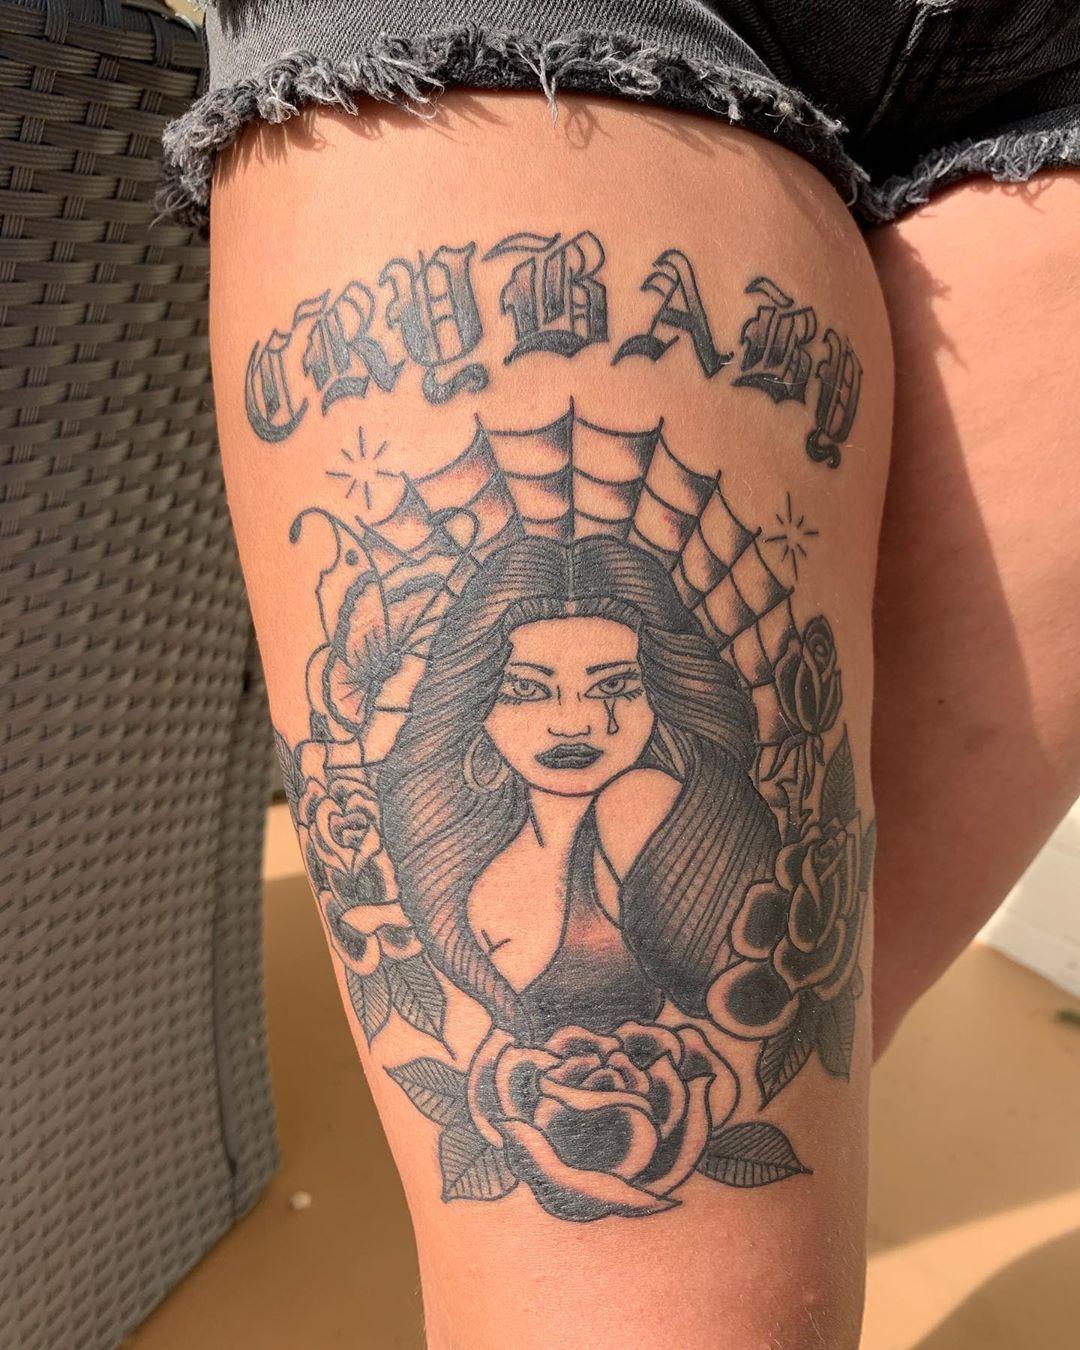 Thank you @ashley.tiffanyxo this was rad! #tattoo #tattoos #tattooing #tattooer #tattooist #tattooedgirls...